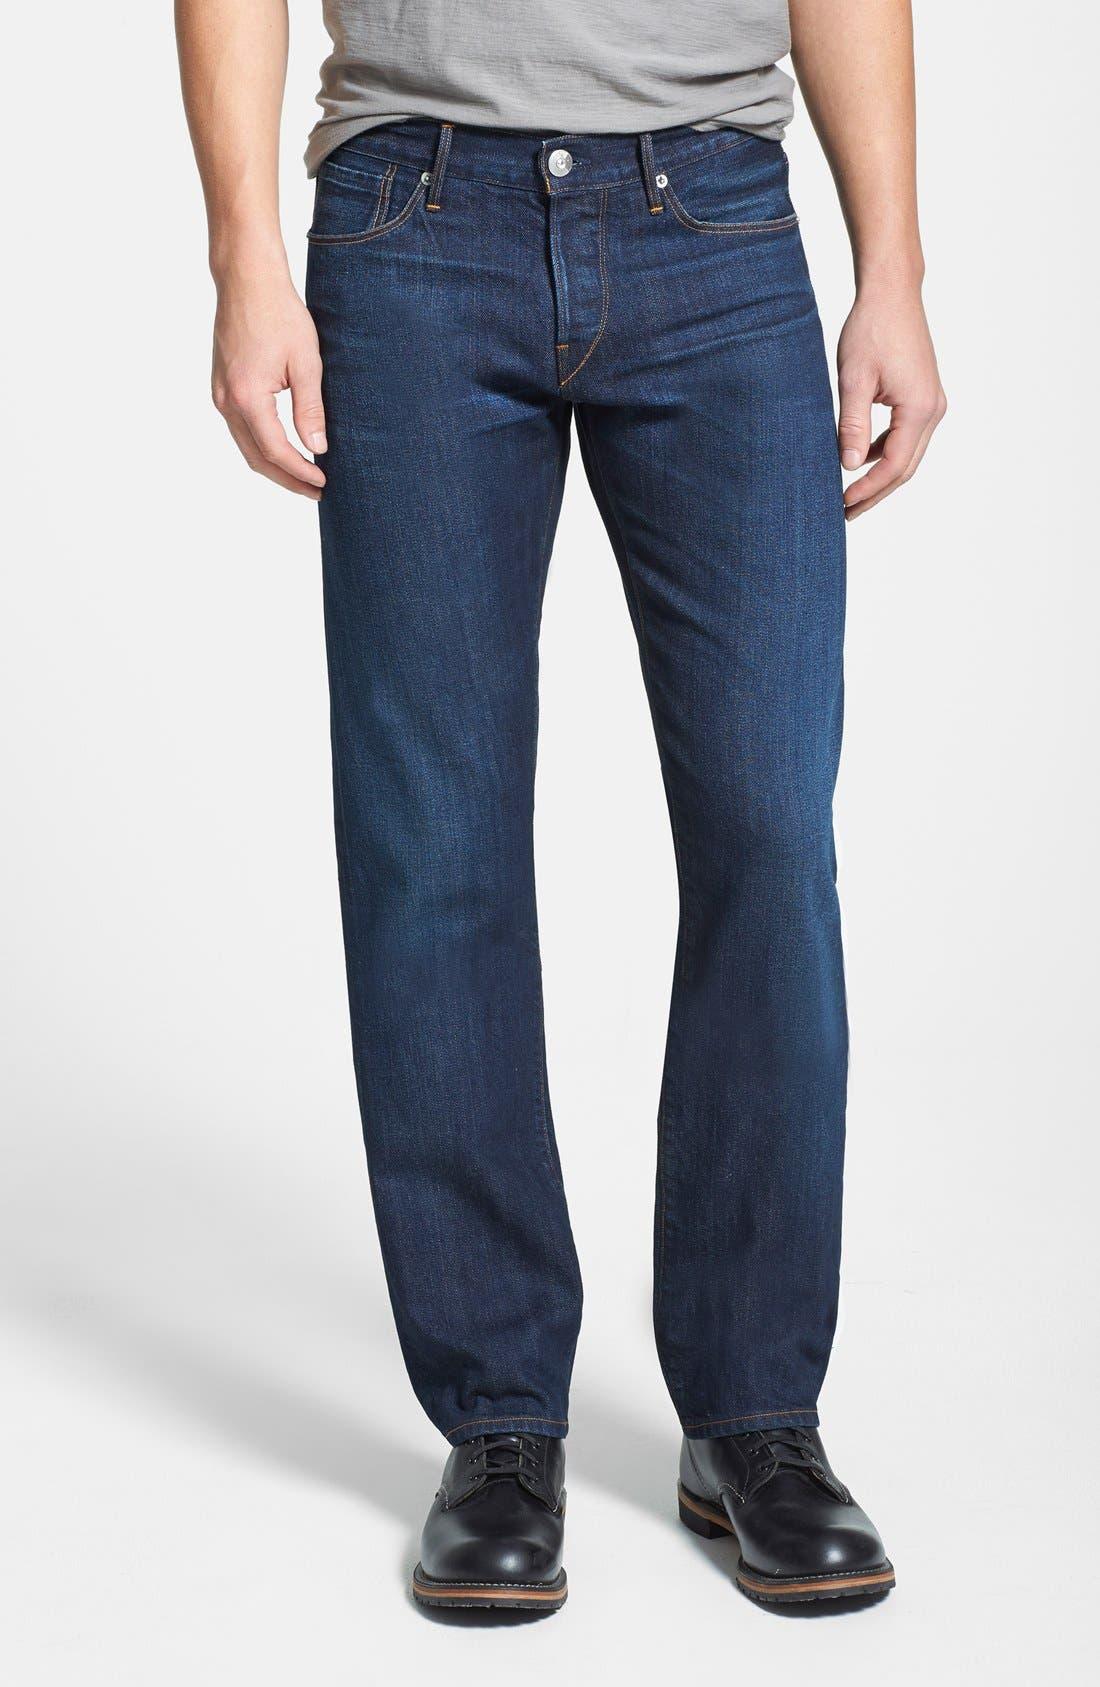 'M4' Straight Leg Selvedge Jeans,                         Main,                         color, 413